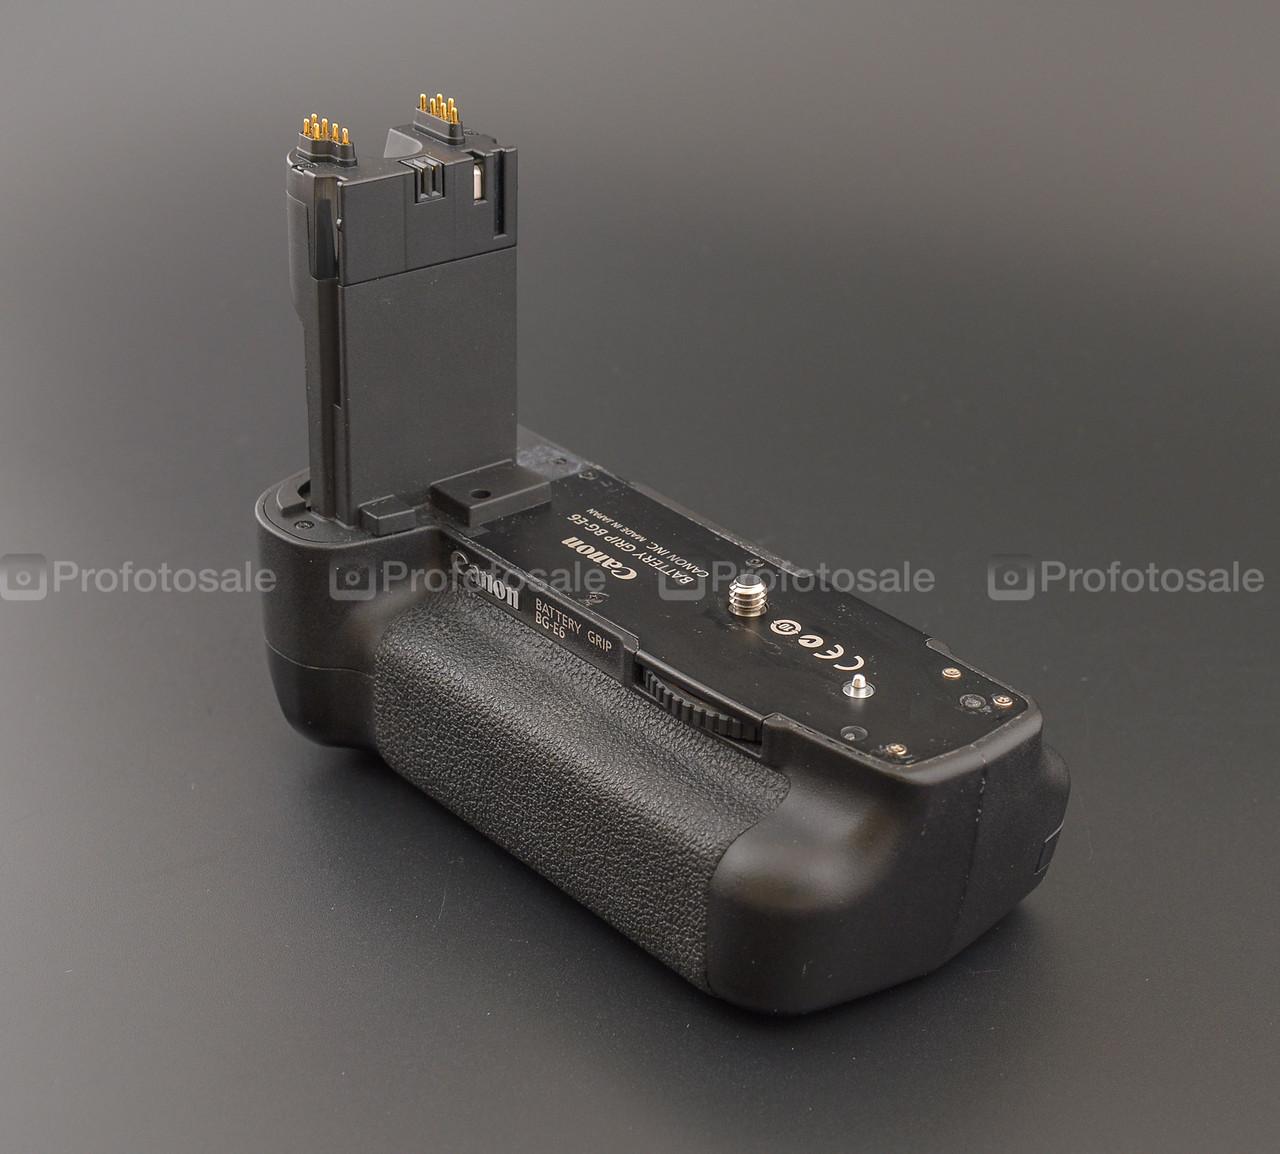 Canon BG-E6 (Оригинальный батарейный блок для Canon 5D mark II)